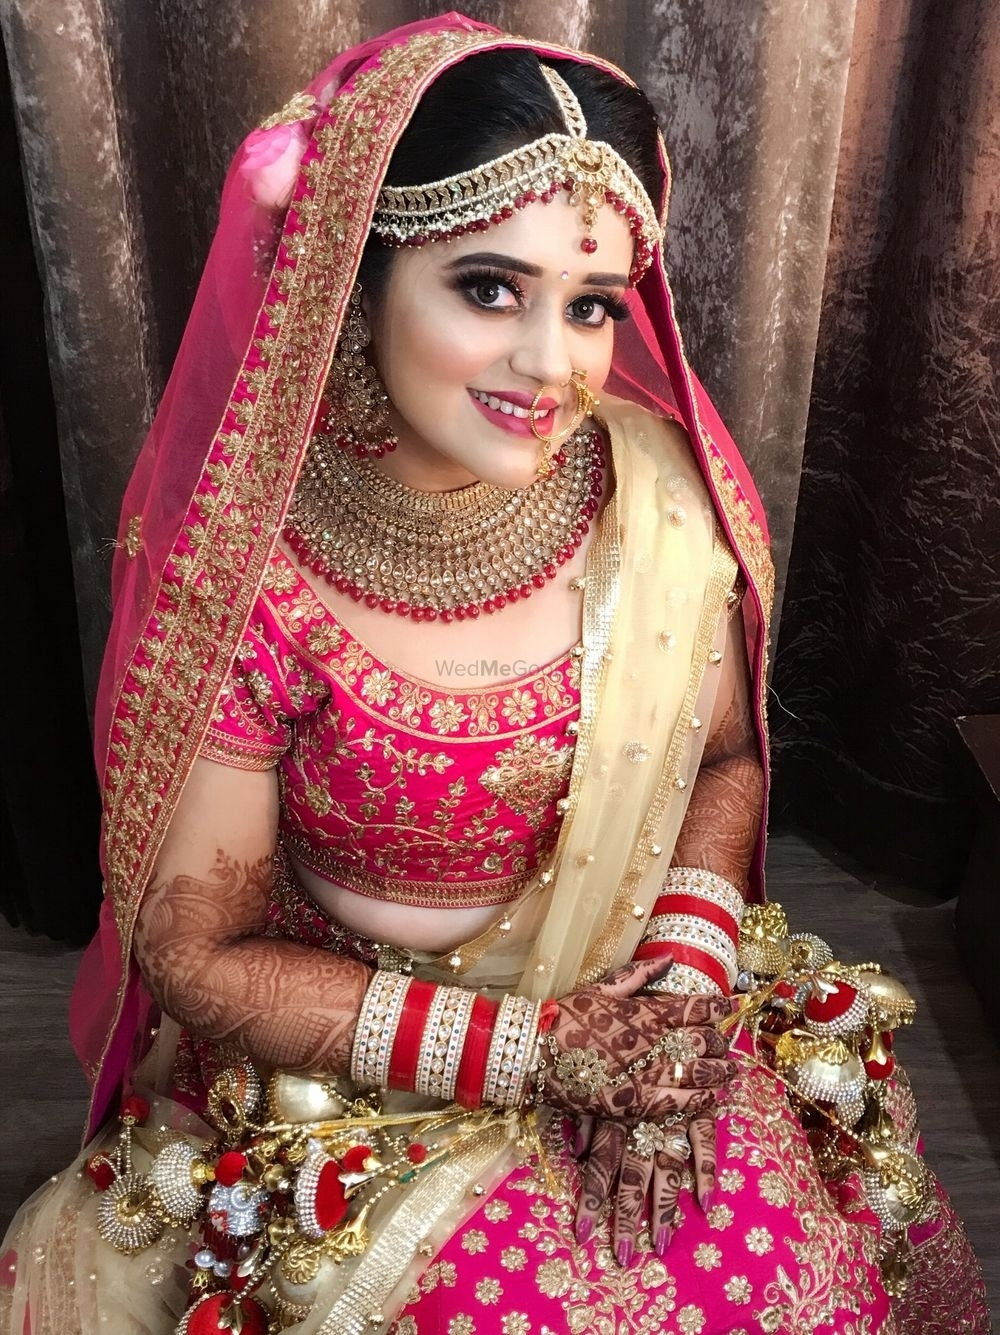 Photo From Ultra Hd Bridal Look - By Yeshna Vij Makeup Artist inside Bridal Makeup Pics Hd